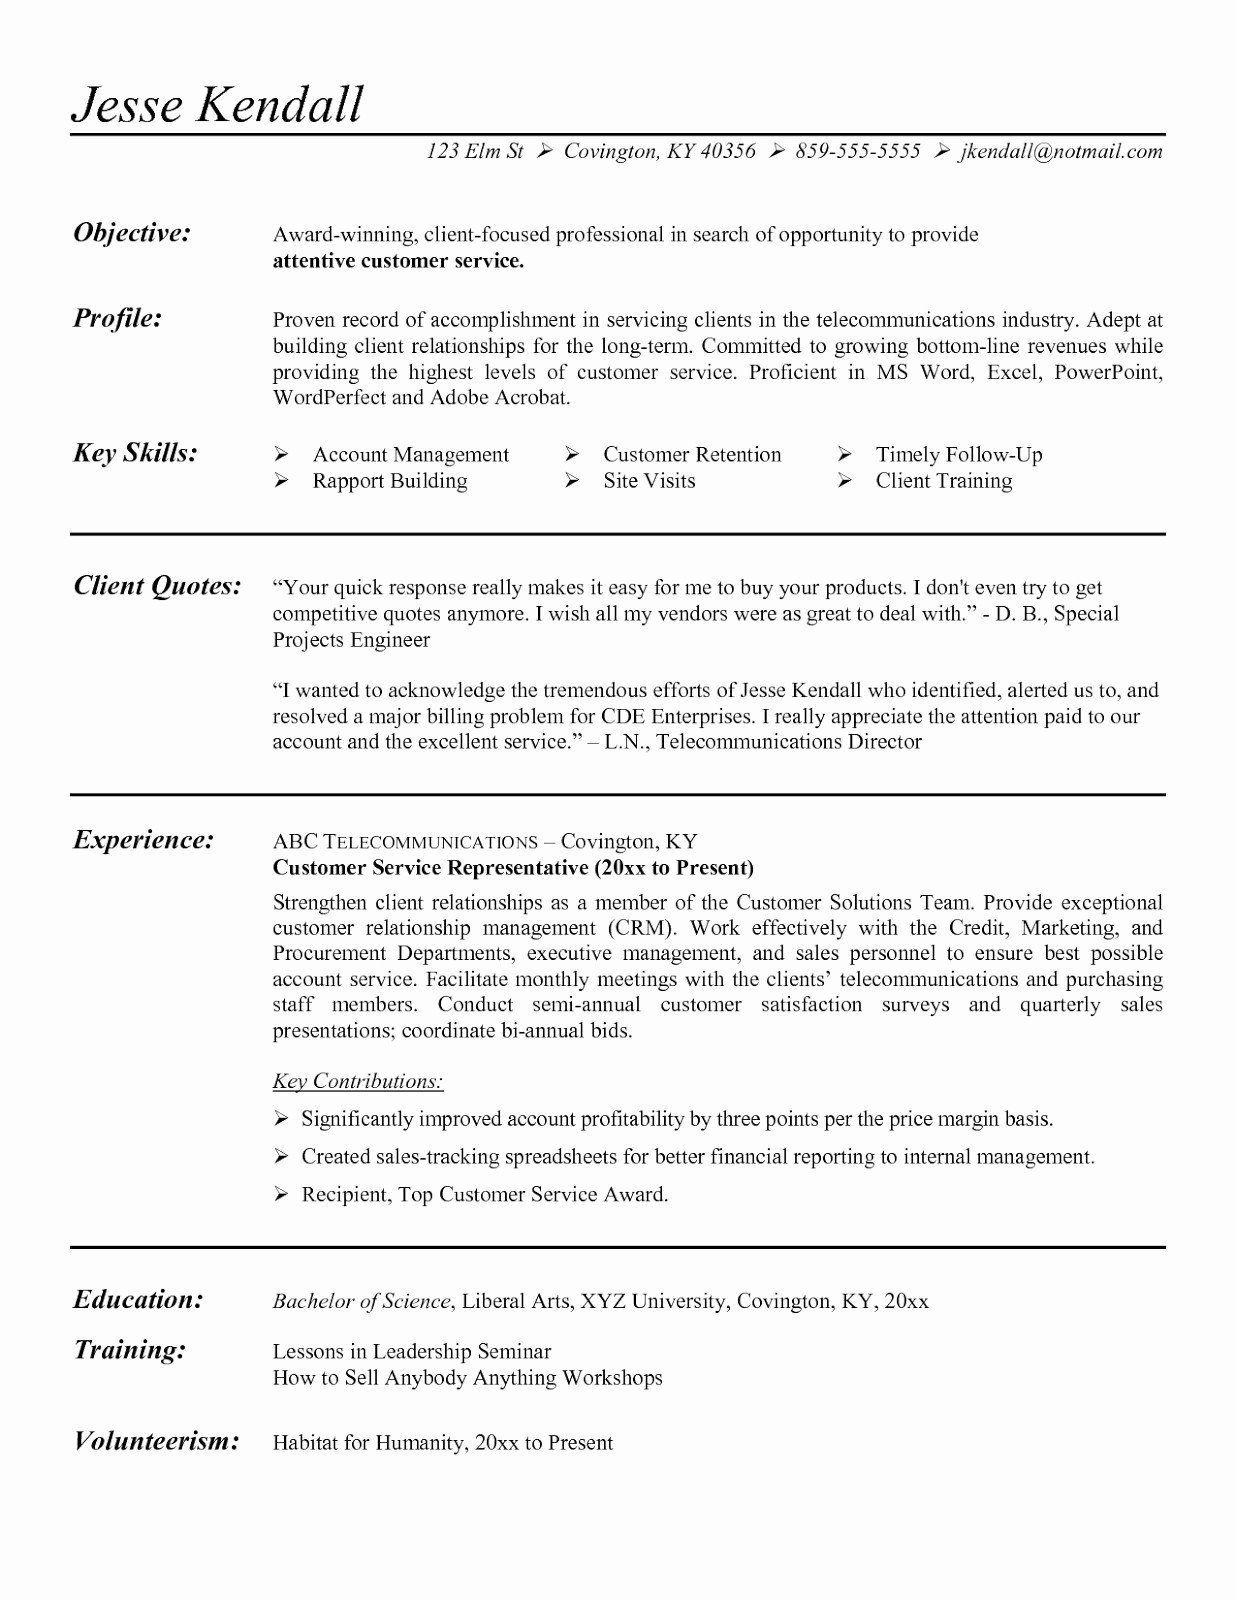 Pharmacy Technician Job Description For Resume Lovely Best Pharmacy Technician Resu Resume Objective Examples Good Objective For Resume Customer Service Resume